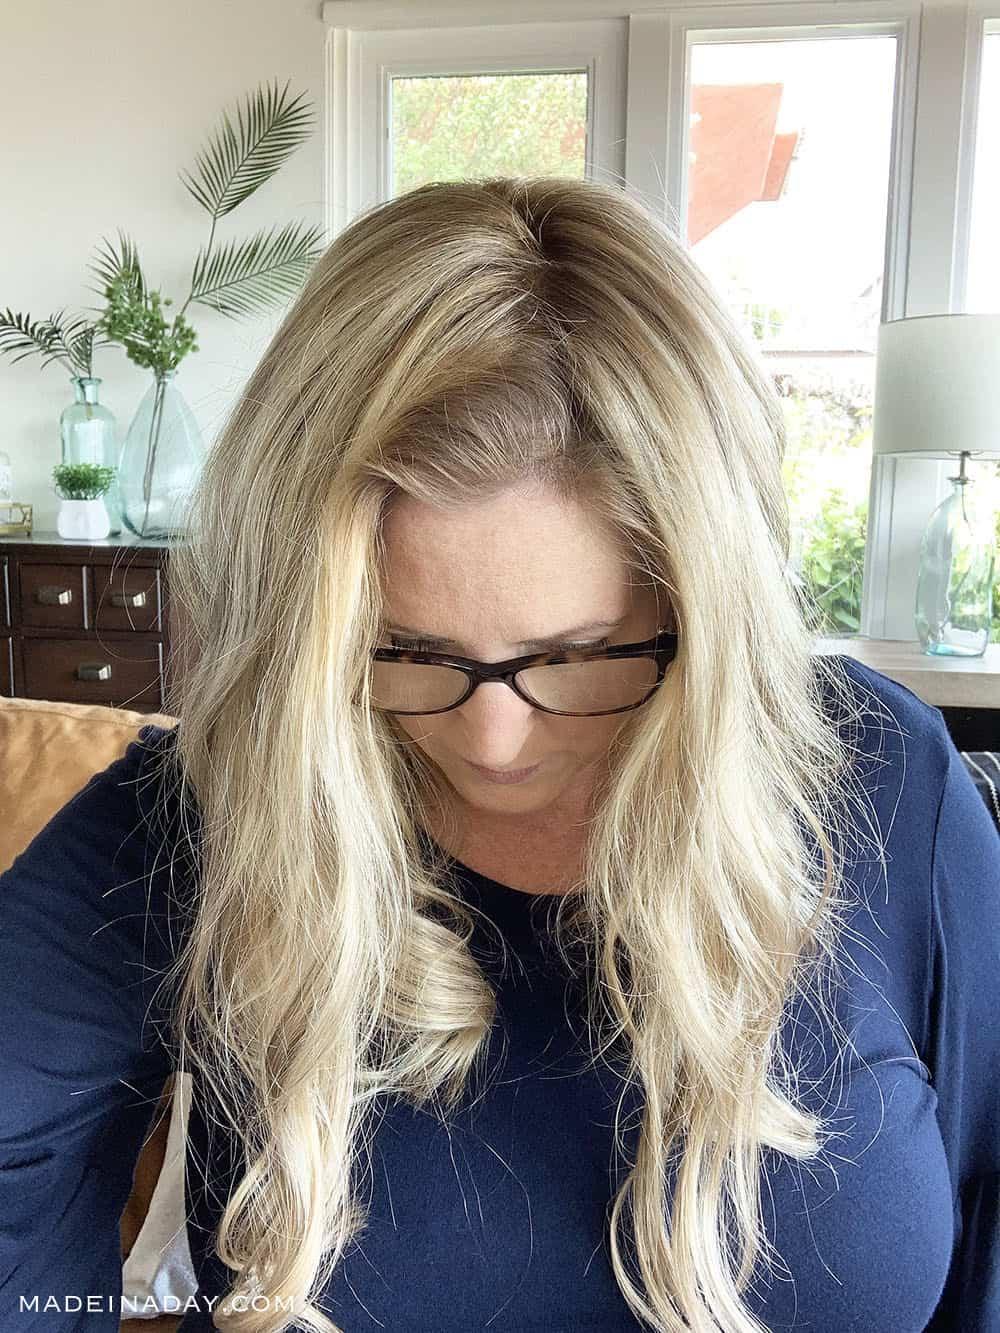 Jon Renau Top Wave 18 inch Blonde topper, Malibu blonde topper review, hairpiece topper